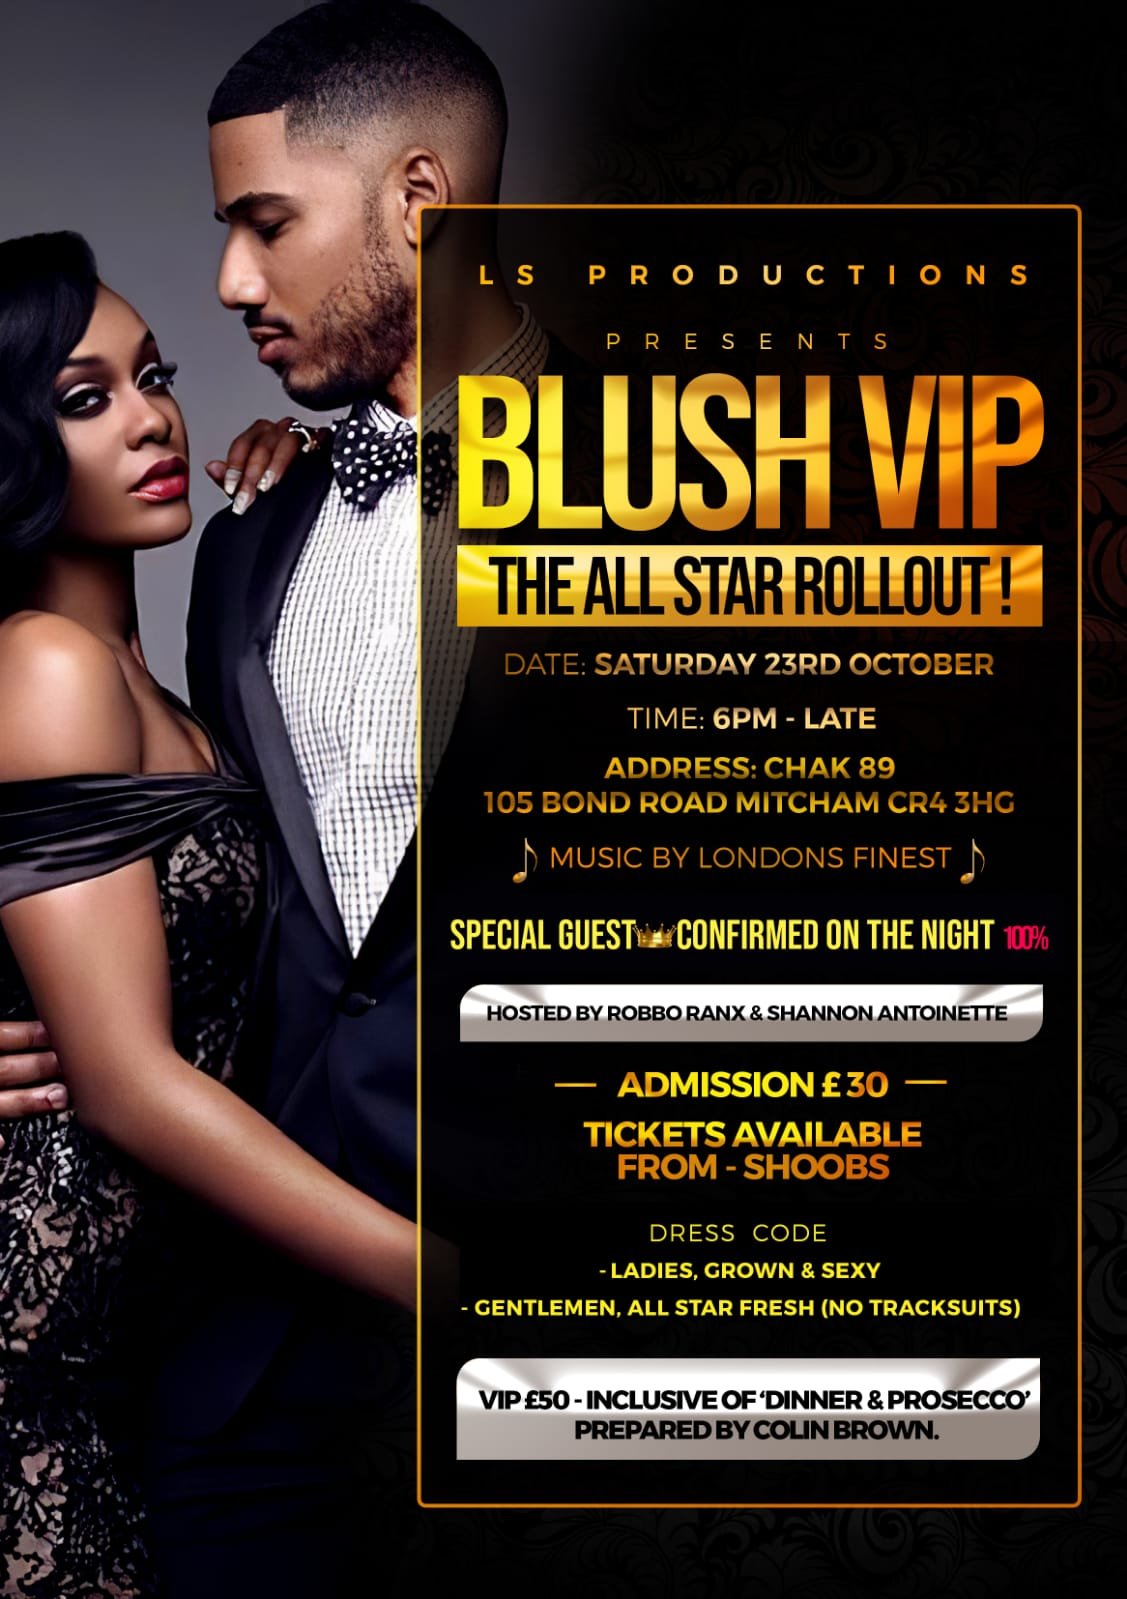 BLUSH VIP